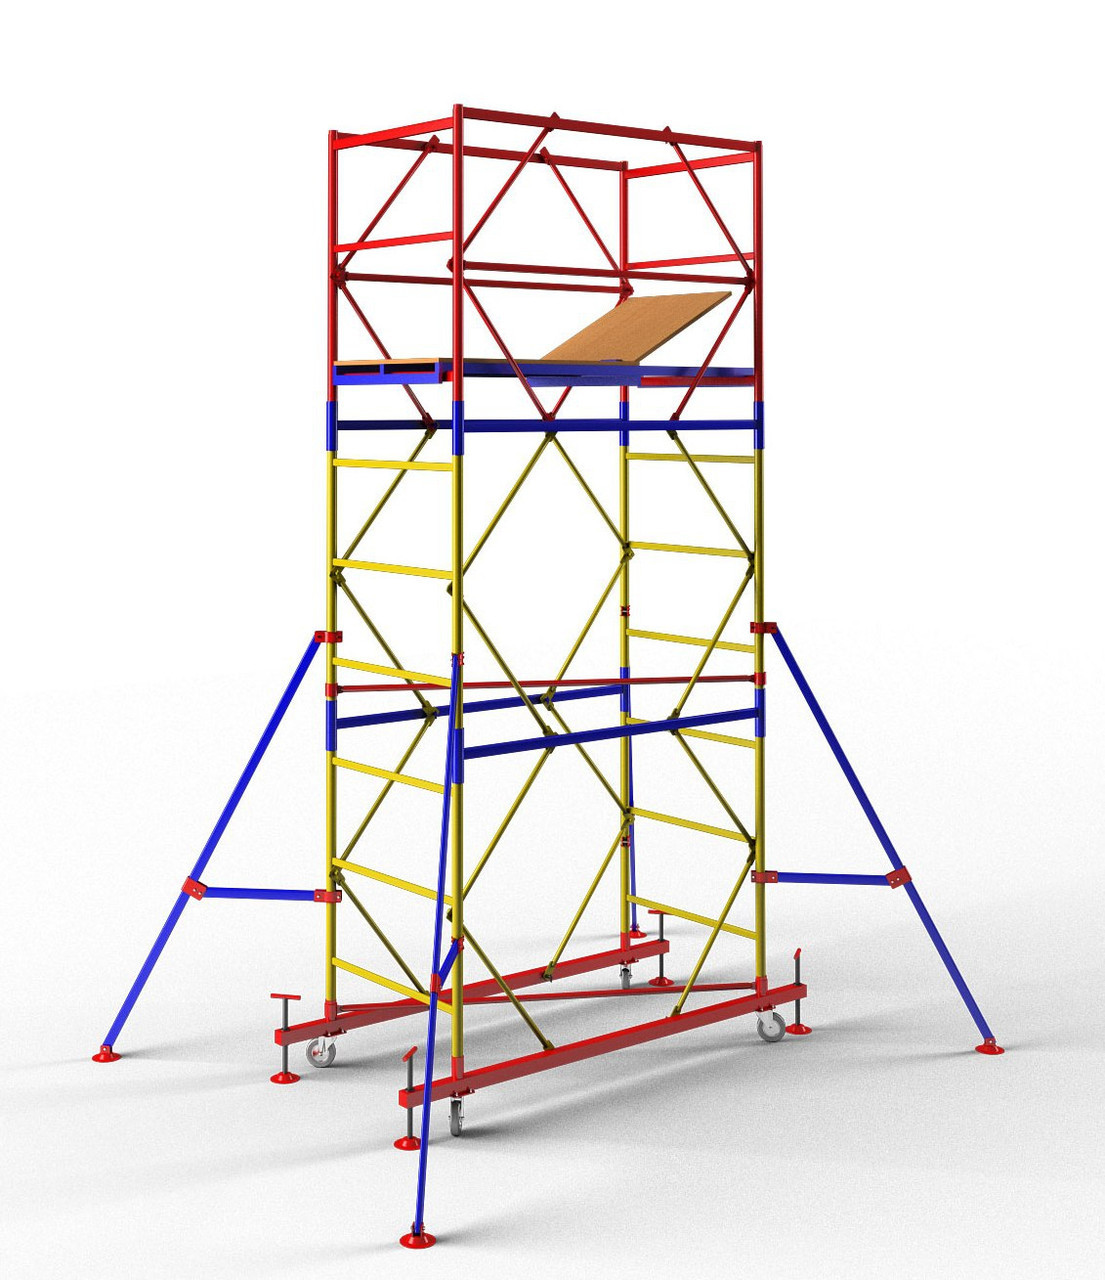 Вышка-тура мобильная облегченная 1,2 х 2,0 м (4+1) Раб.высота 7,4 м